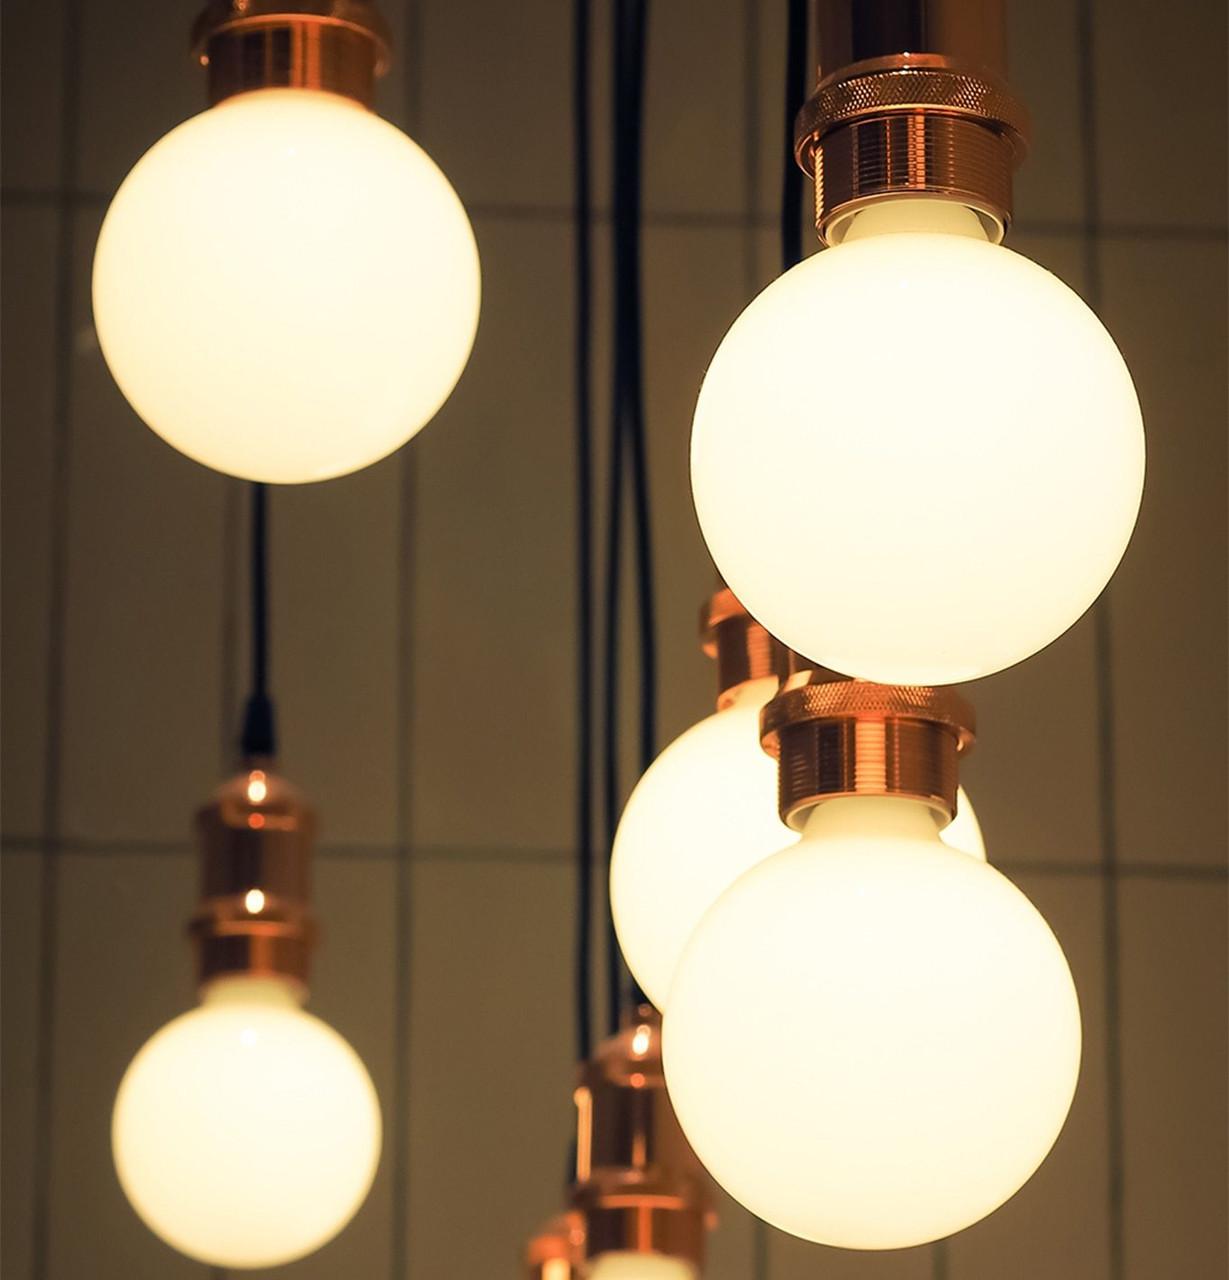 LED G80 ES Light Bulbs